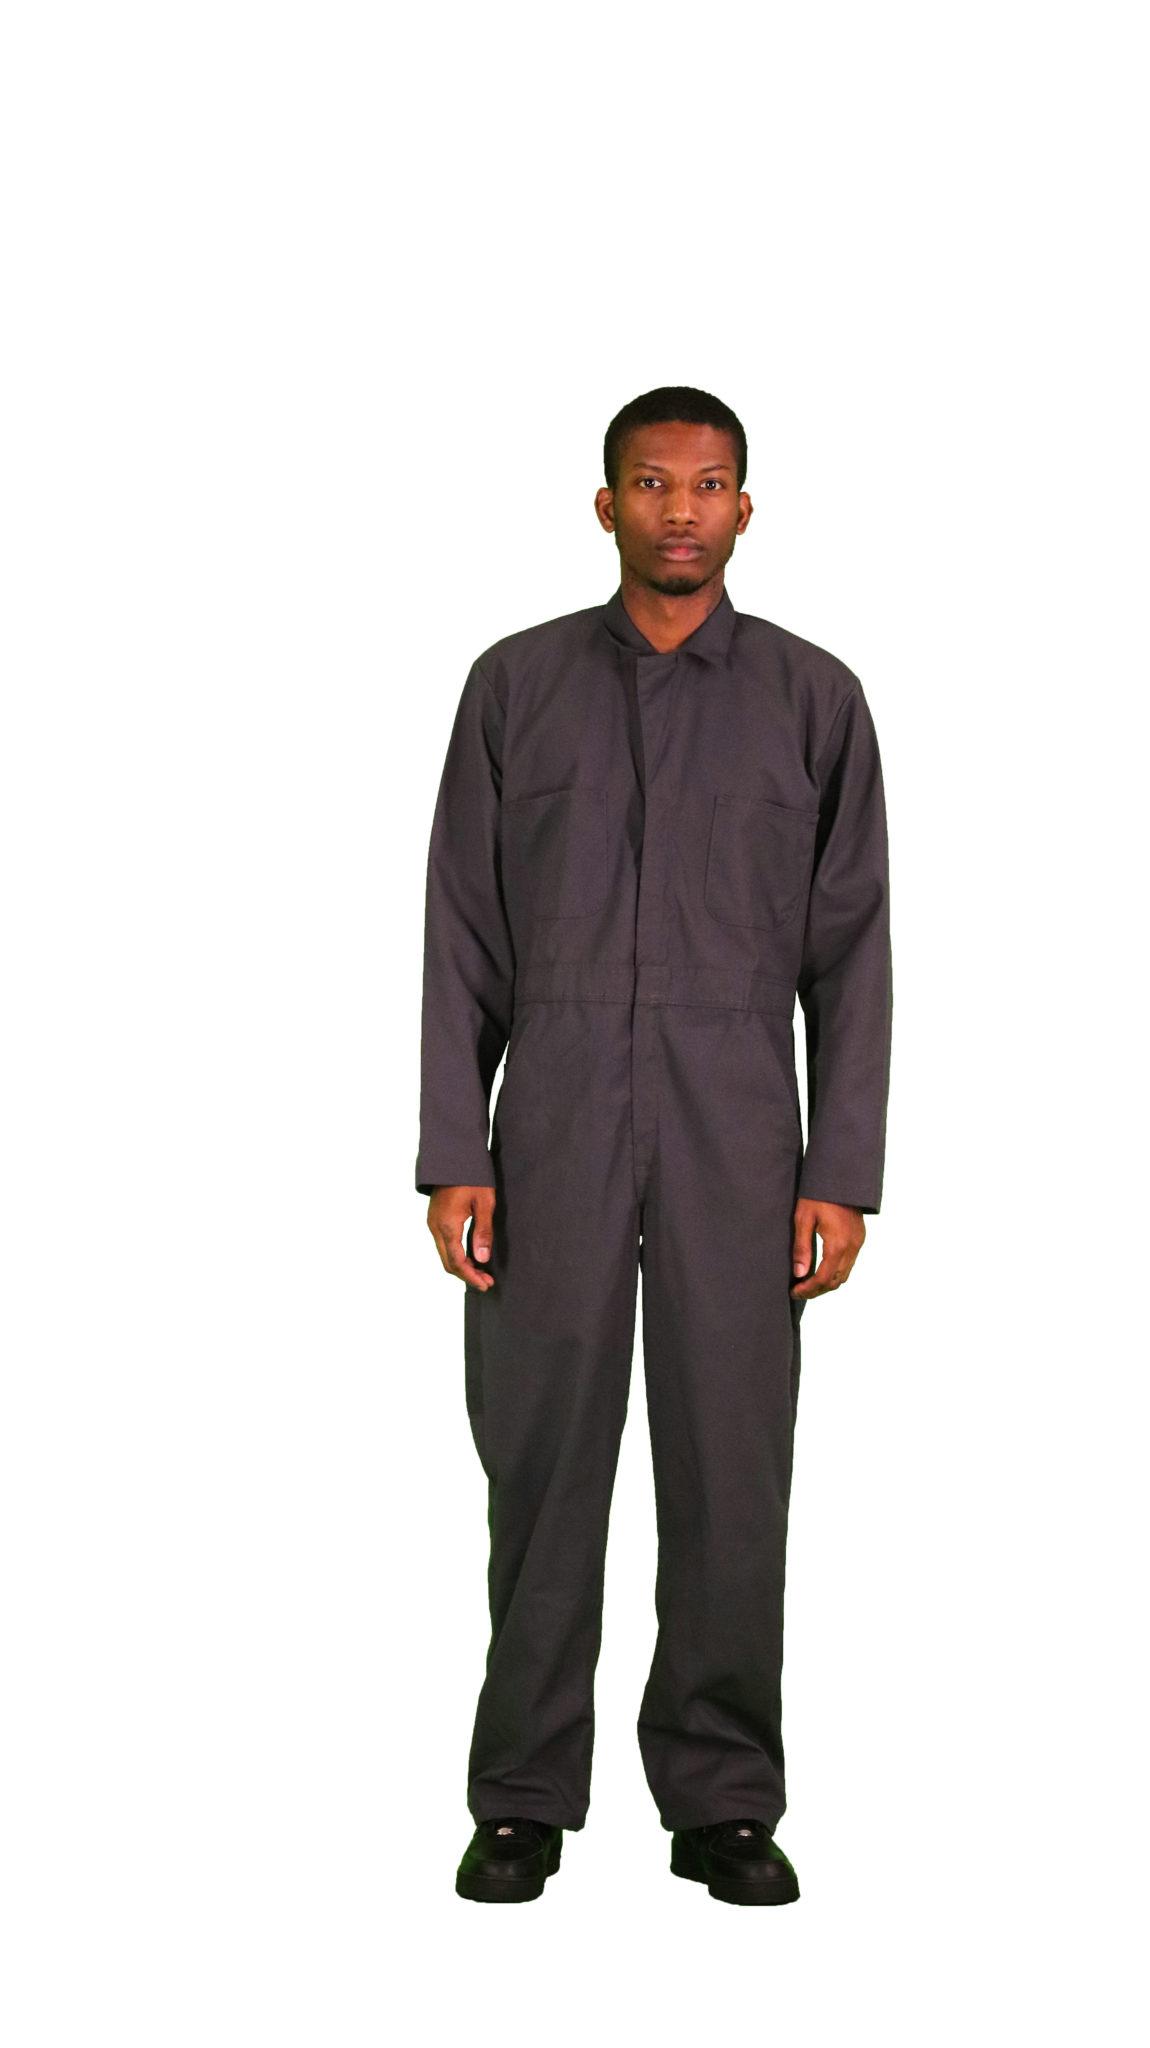 Janitor Costume Rentals